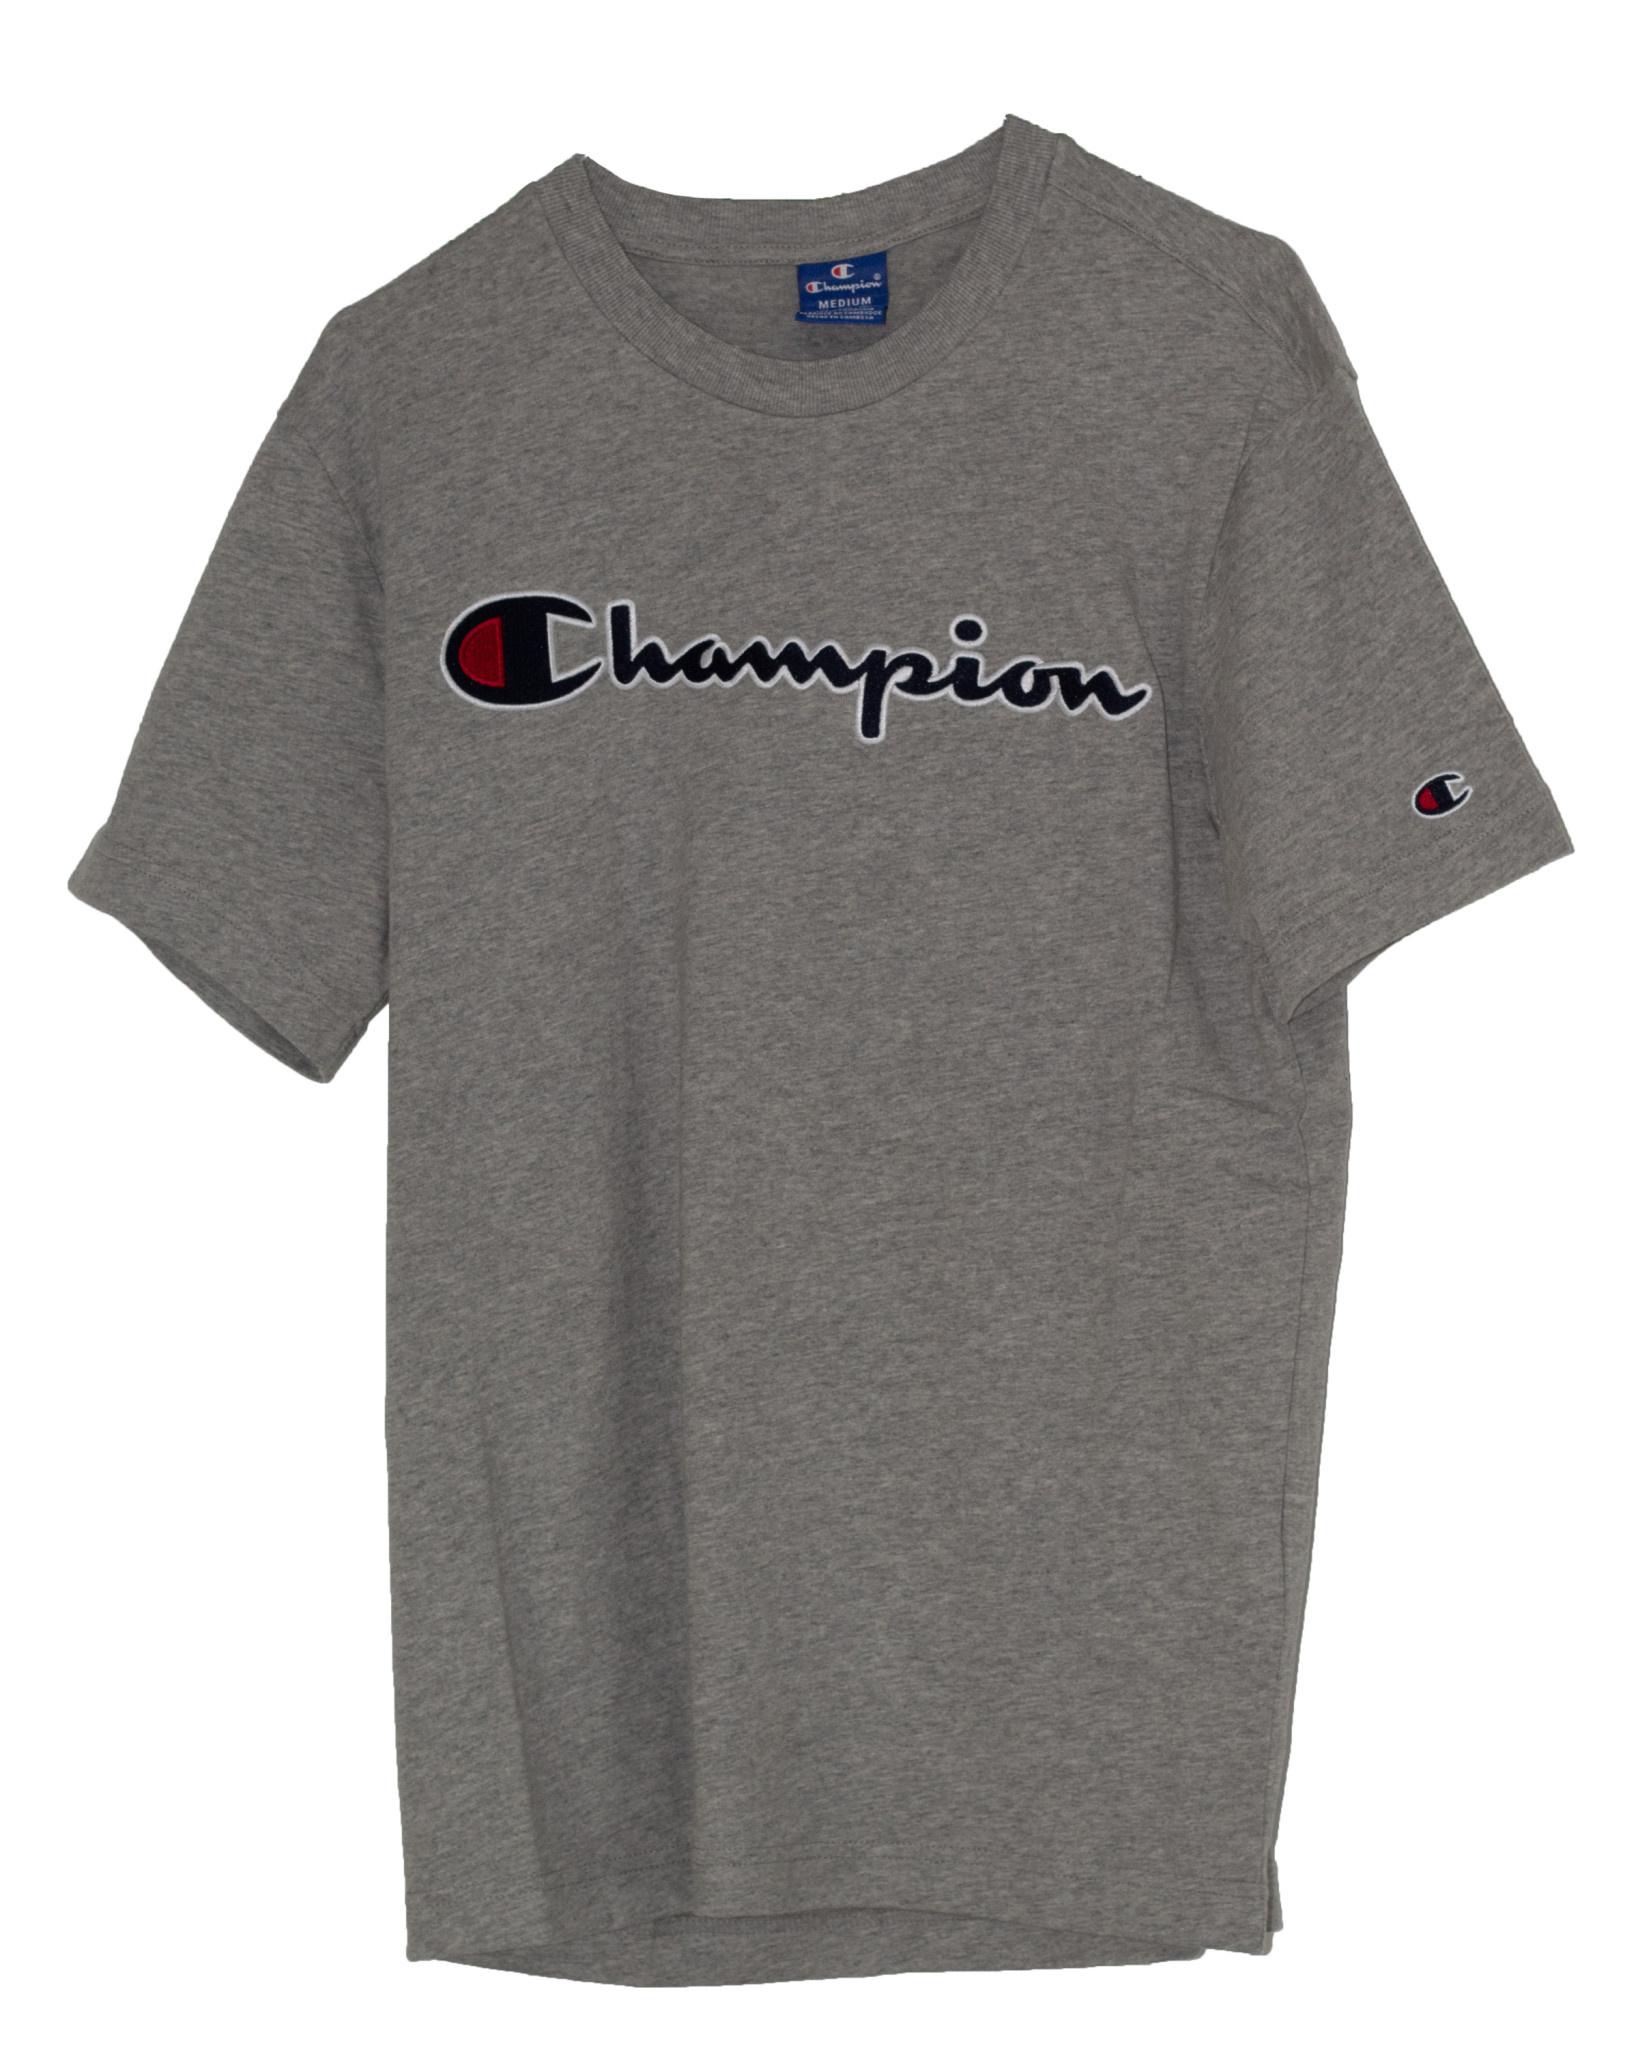 CHAMPION CREWNECK T-SHIRT Grey